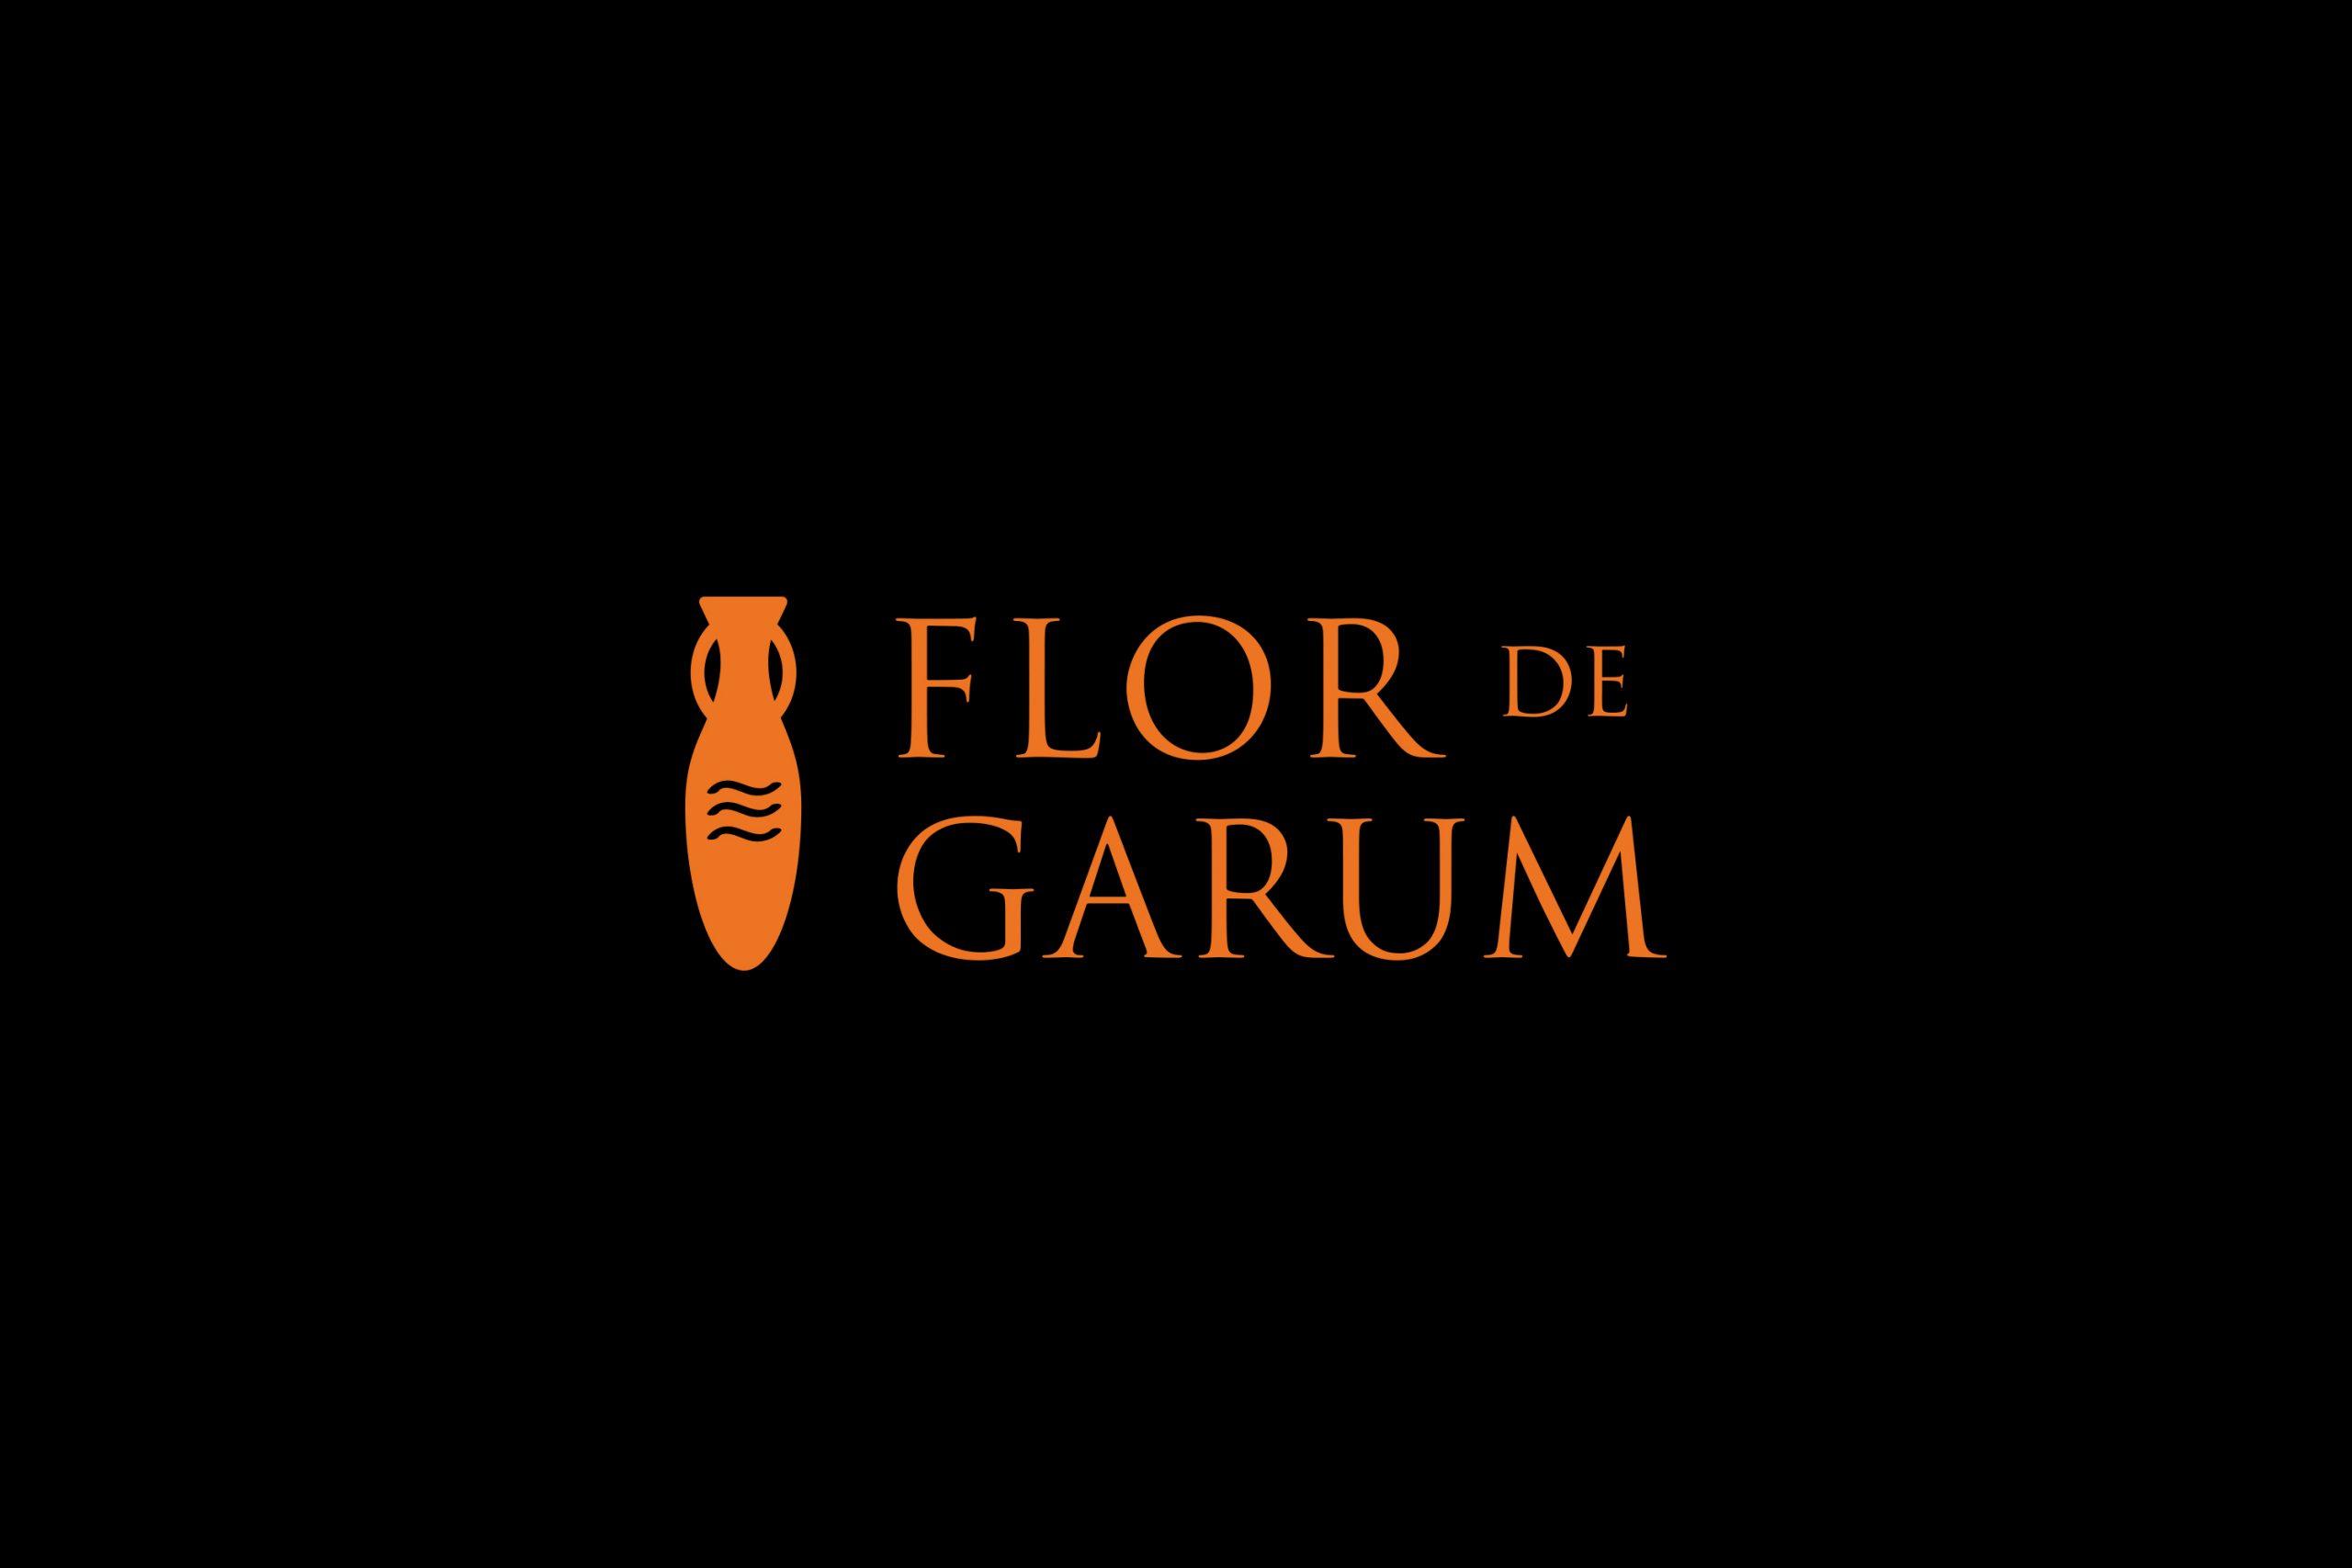 Flor de Garum by Salvartes Design - Creative Work